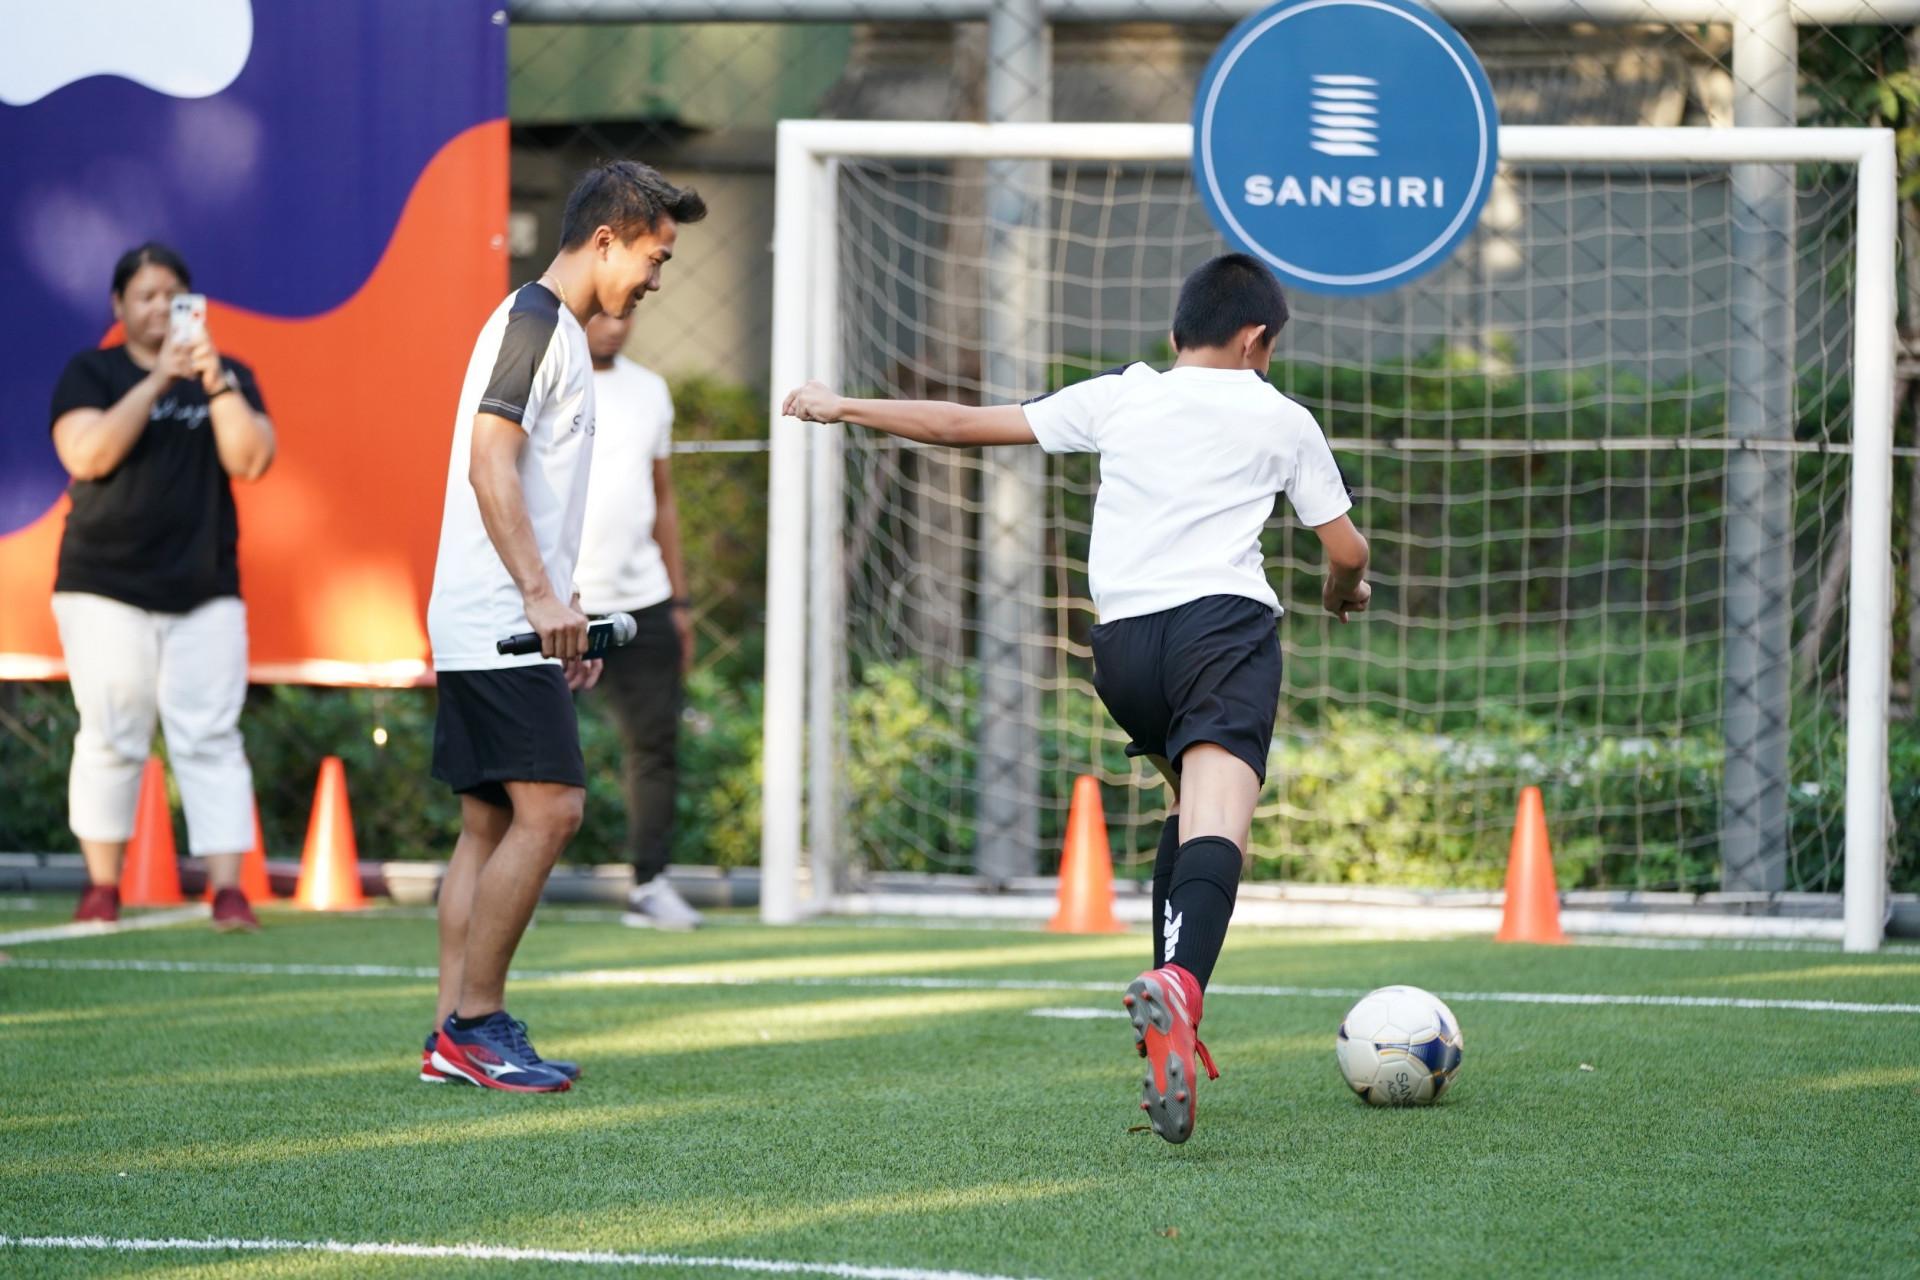 Sansiri X Messi Jay Football Workshop เจ ชนาธิป j chanathip